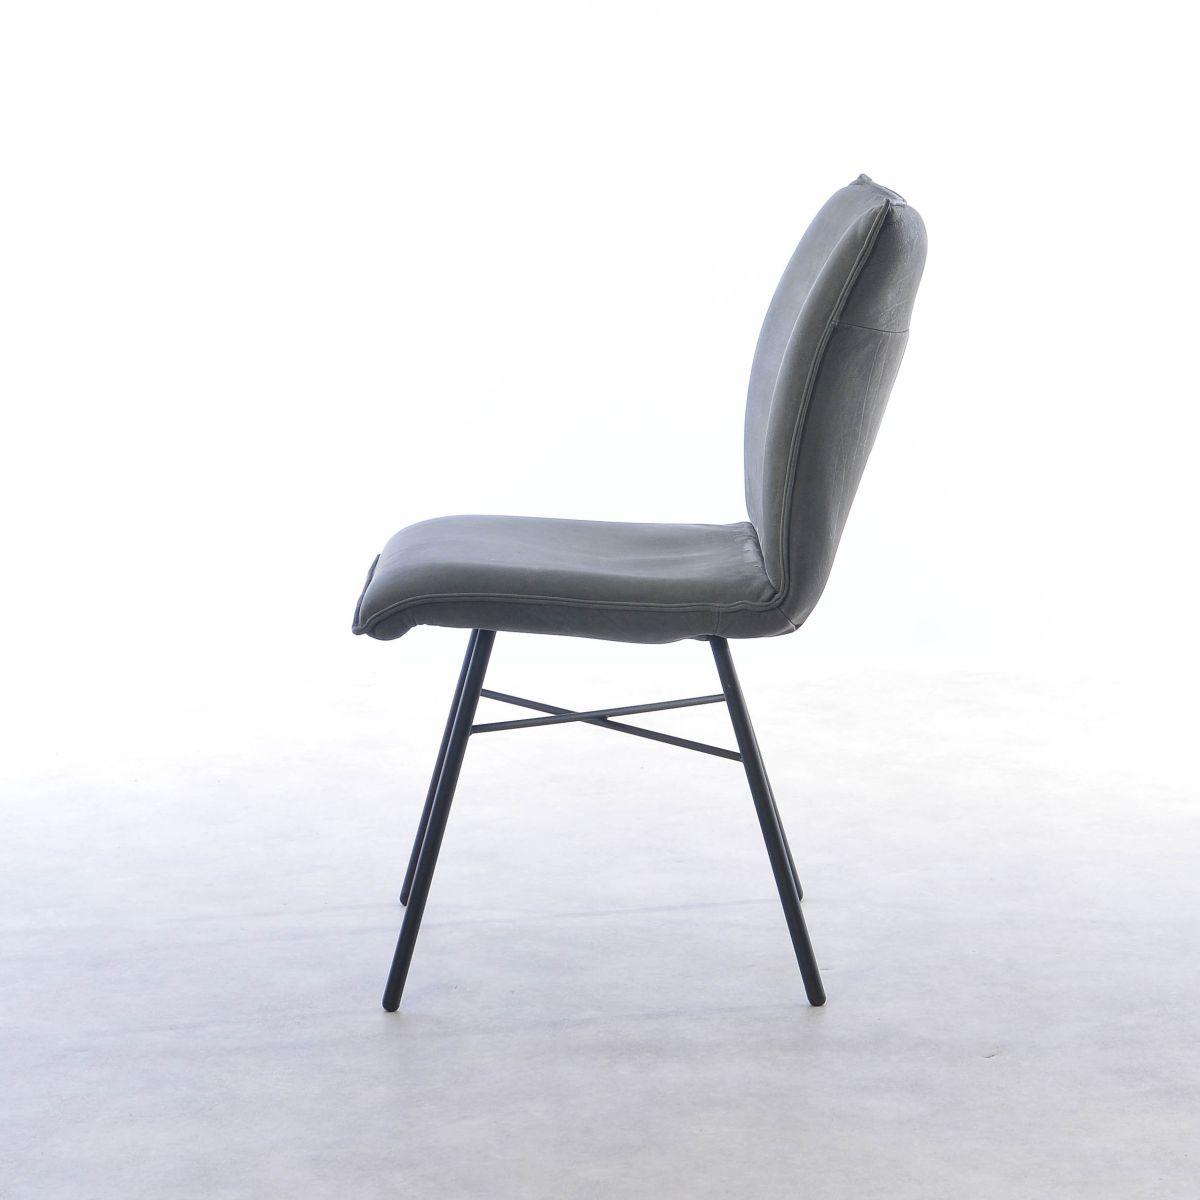 Dining room chair Pepijn